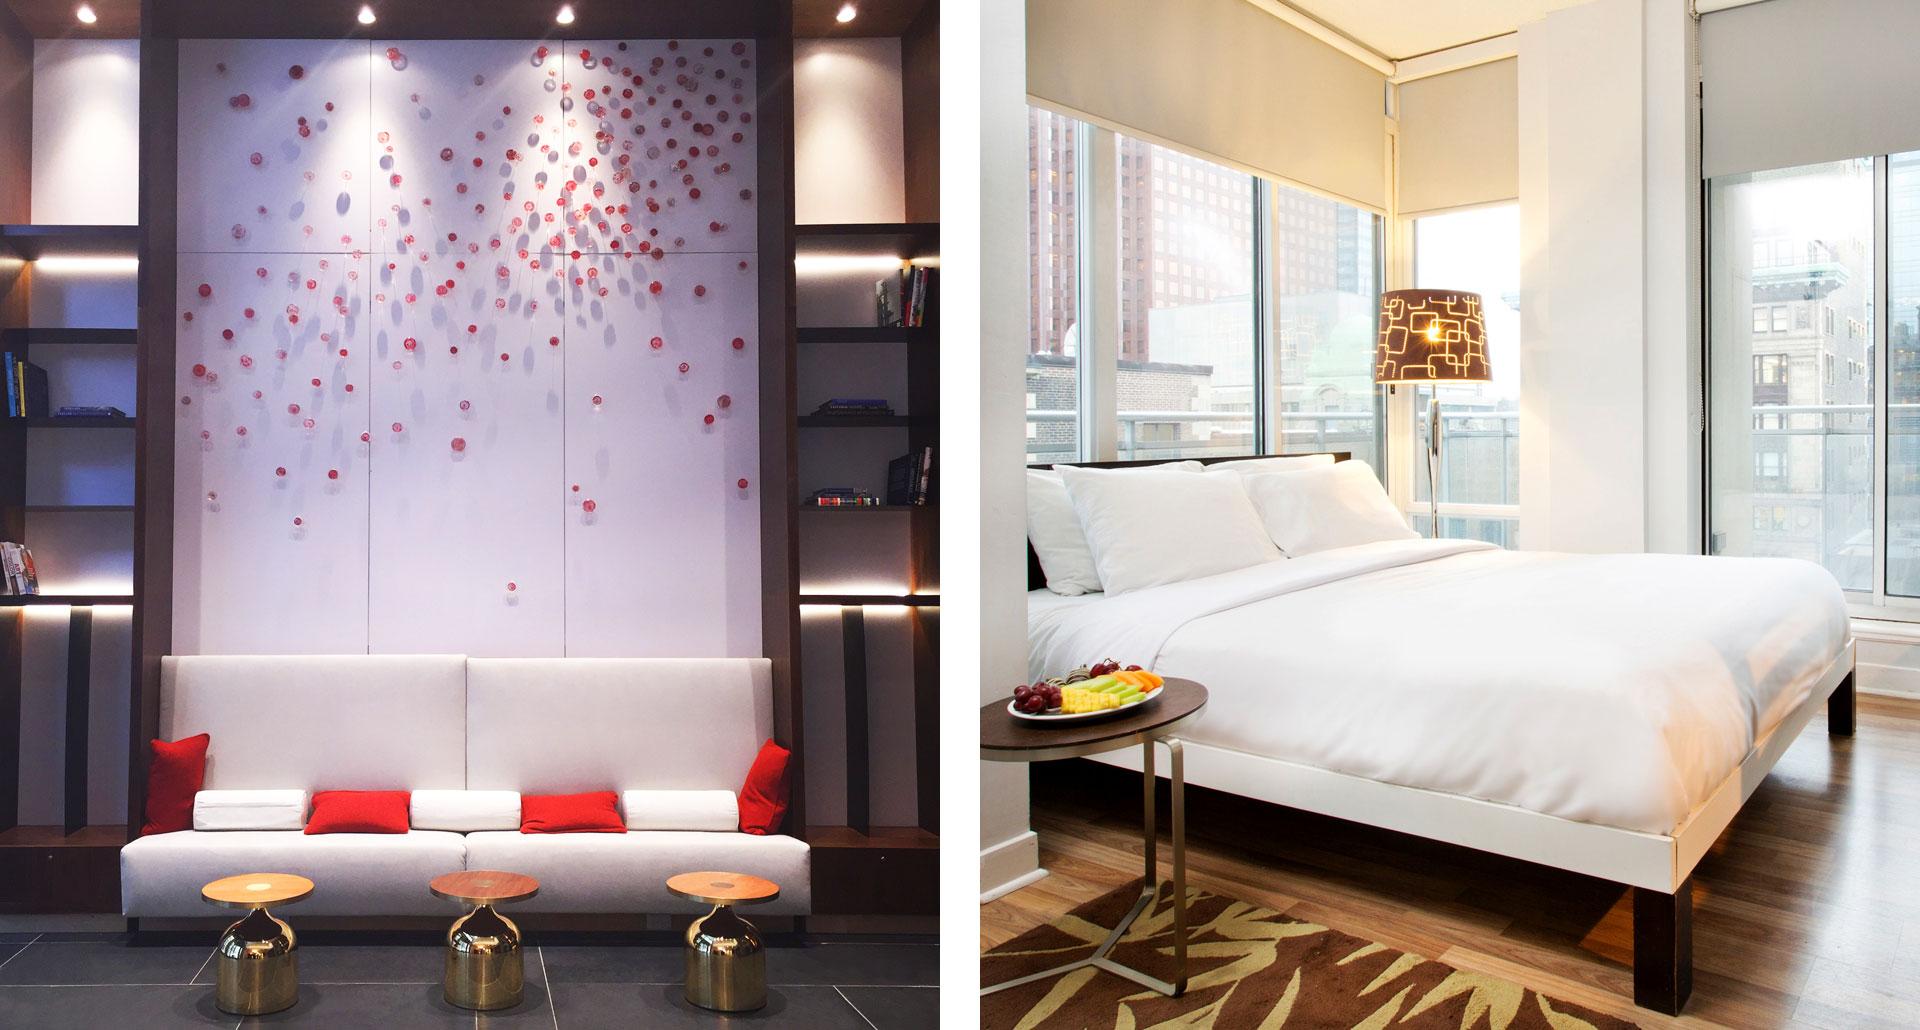 Executive Hotel Cosmopolitan - boutique hotel in Toronto